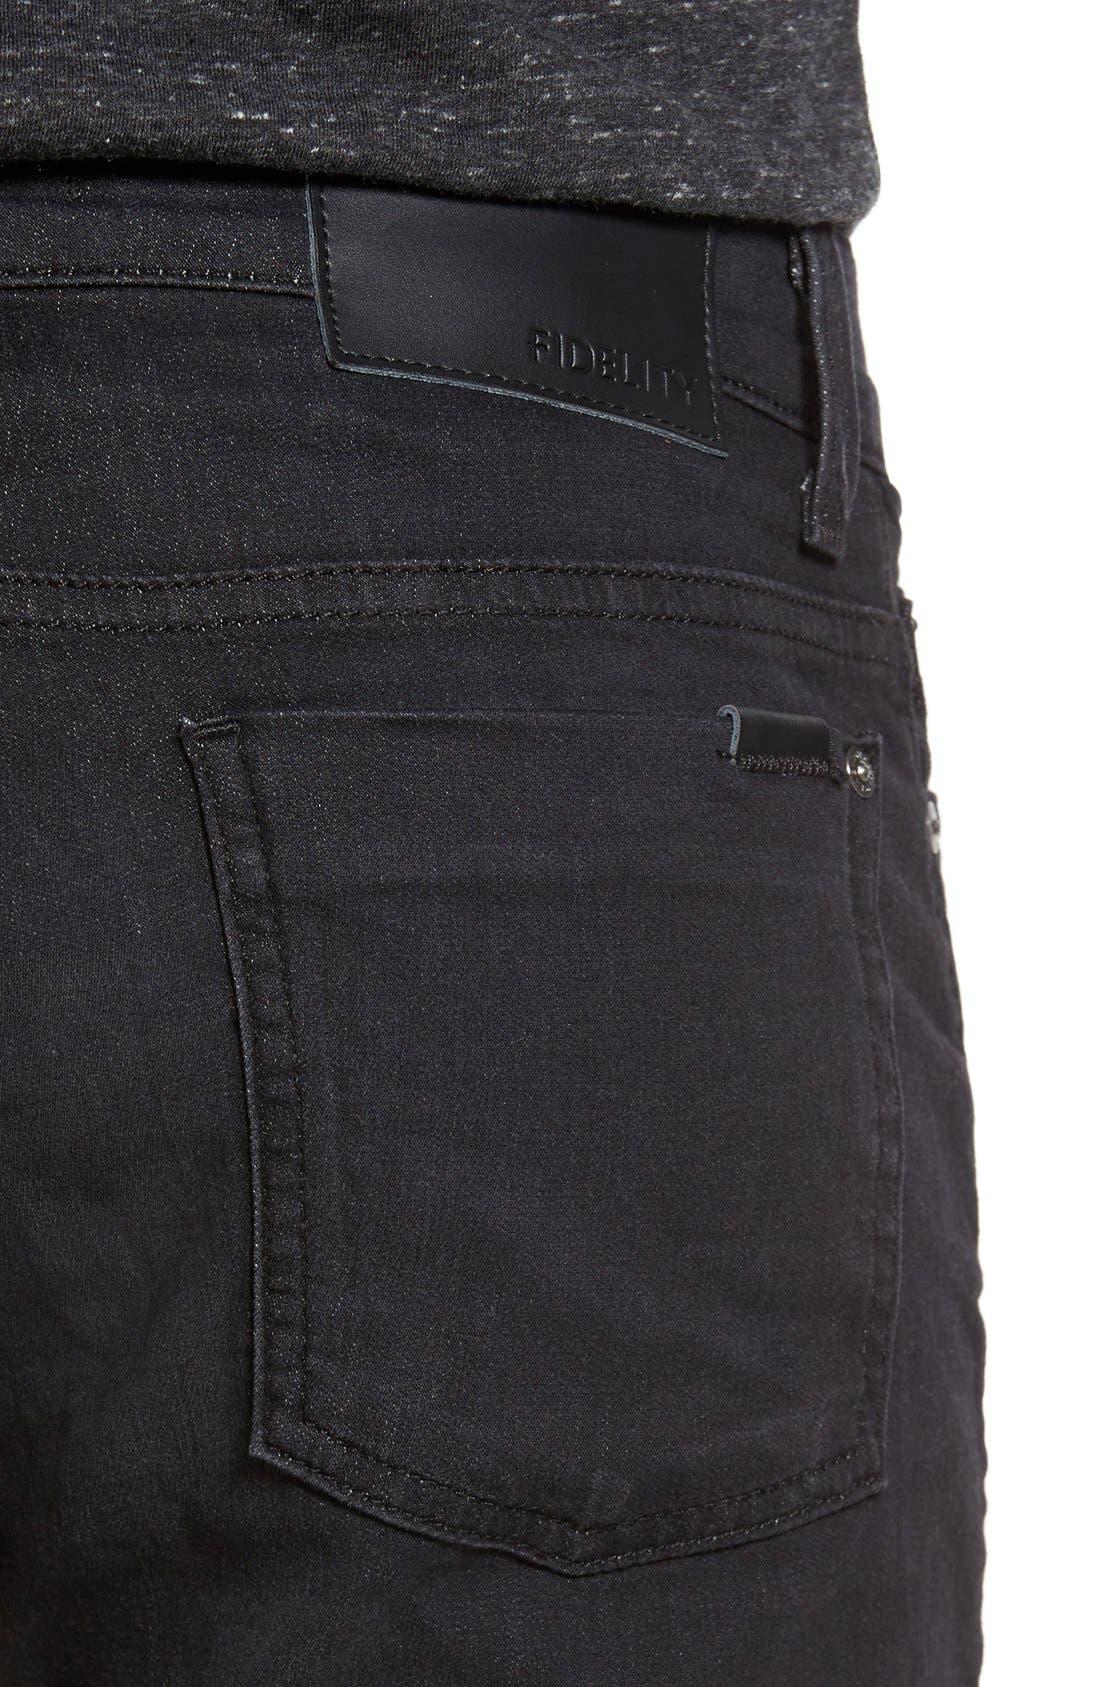 Torino Slim Fit Jeans,                             Alternate thumbnail 7, color,                             001